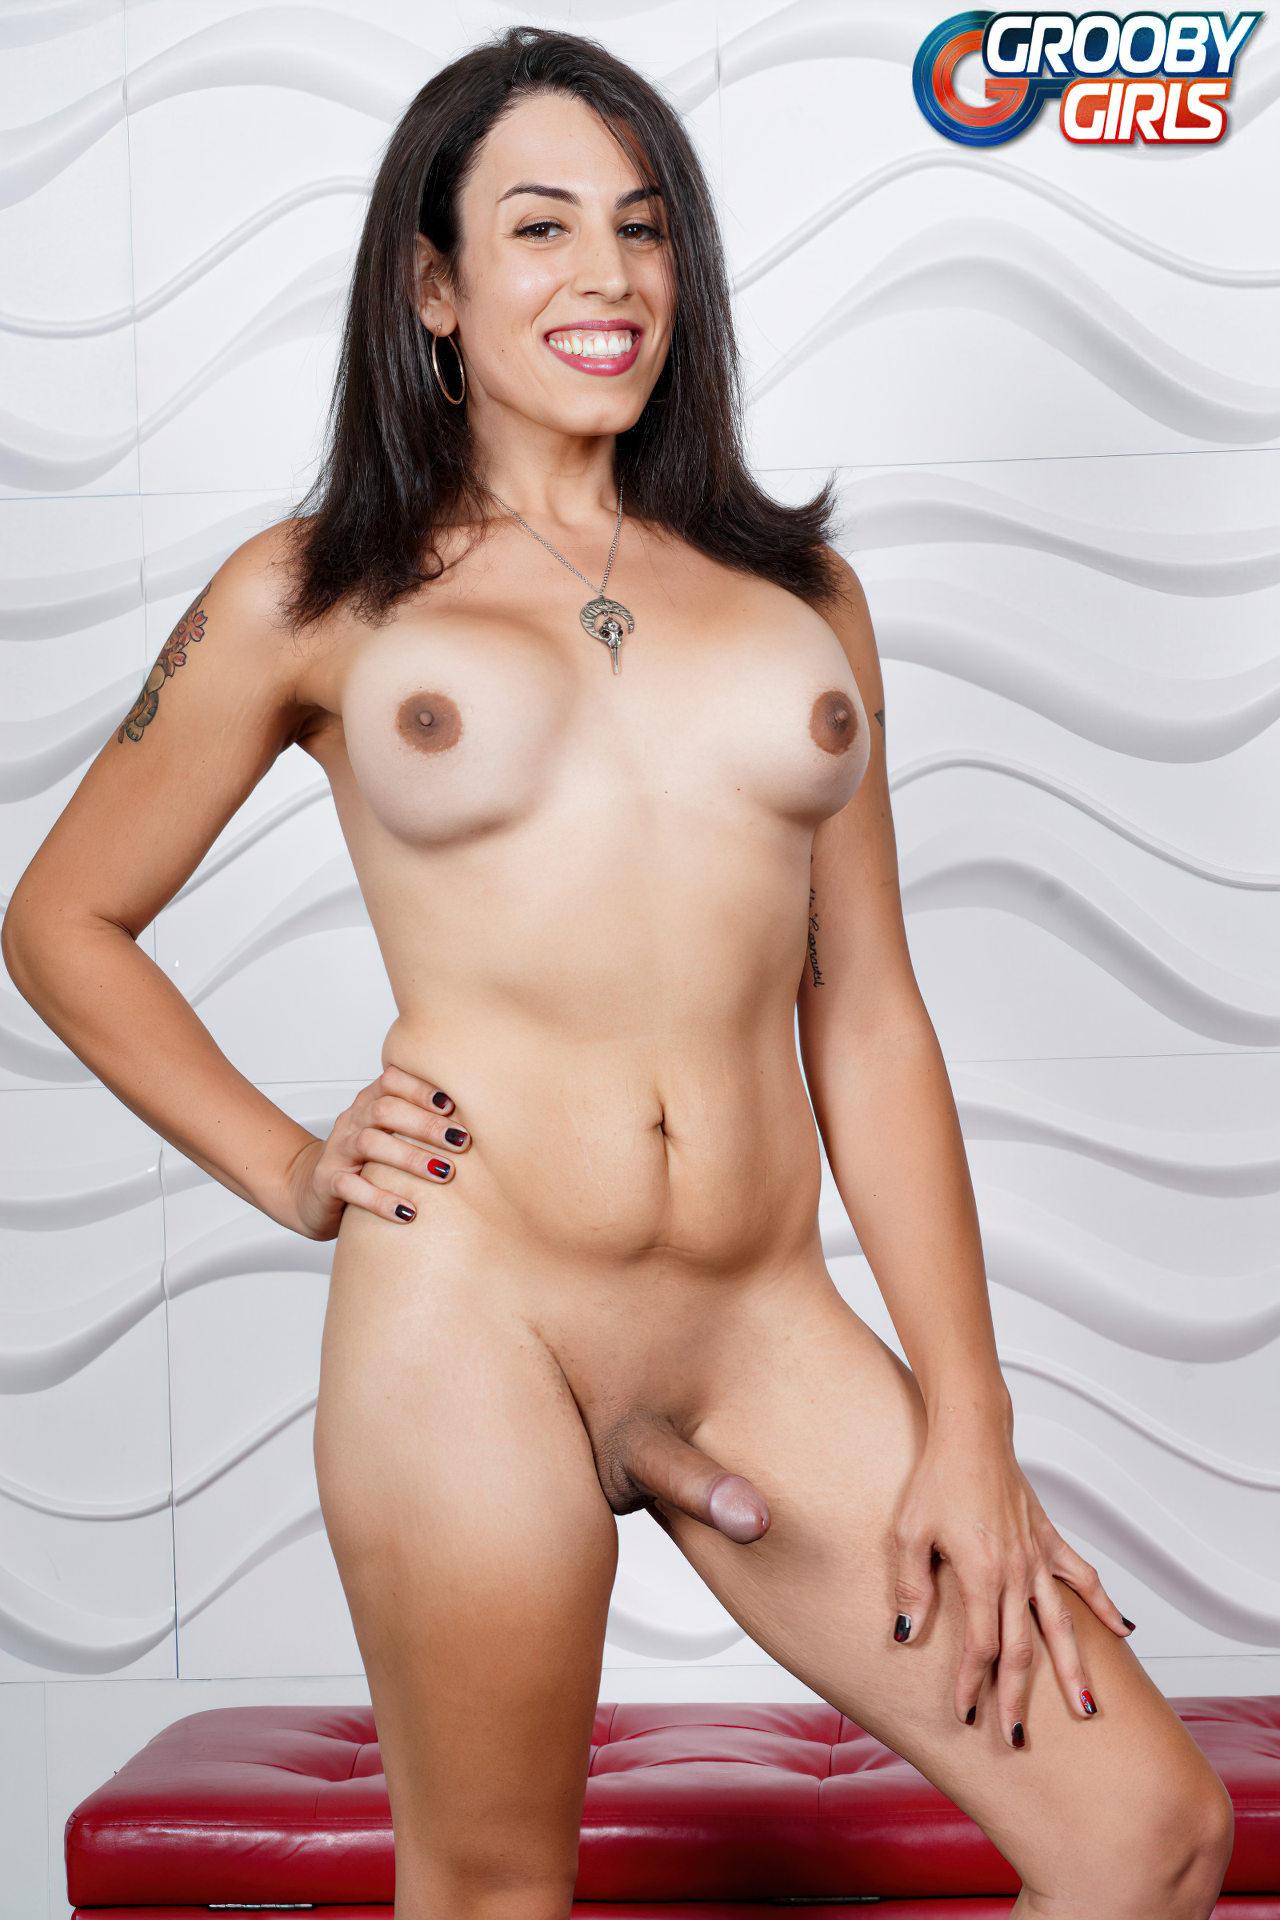 Travestis Imagens (10)